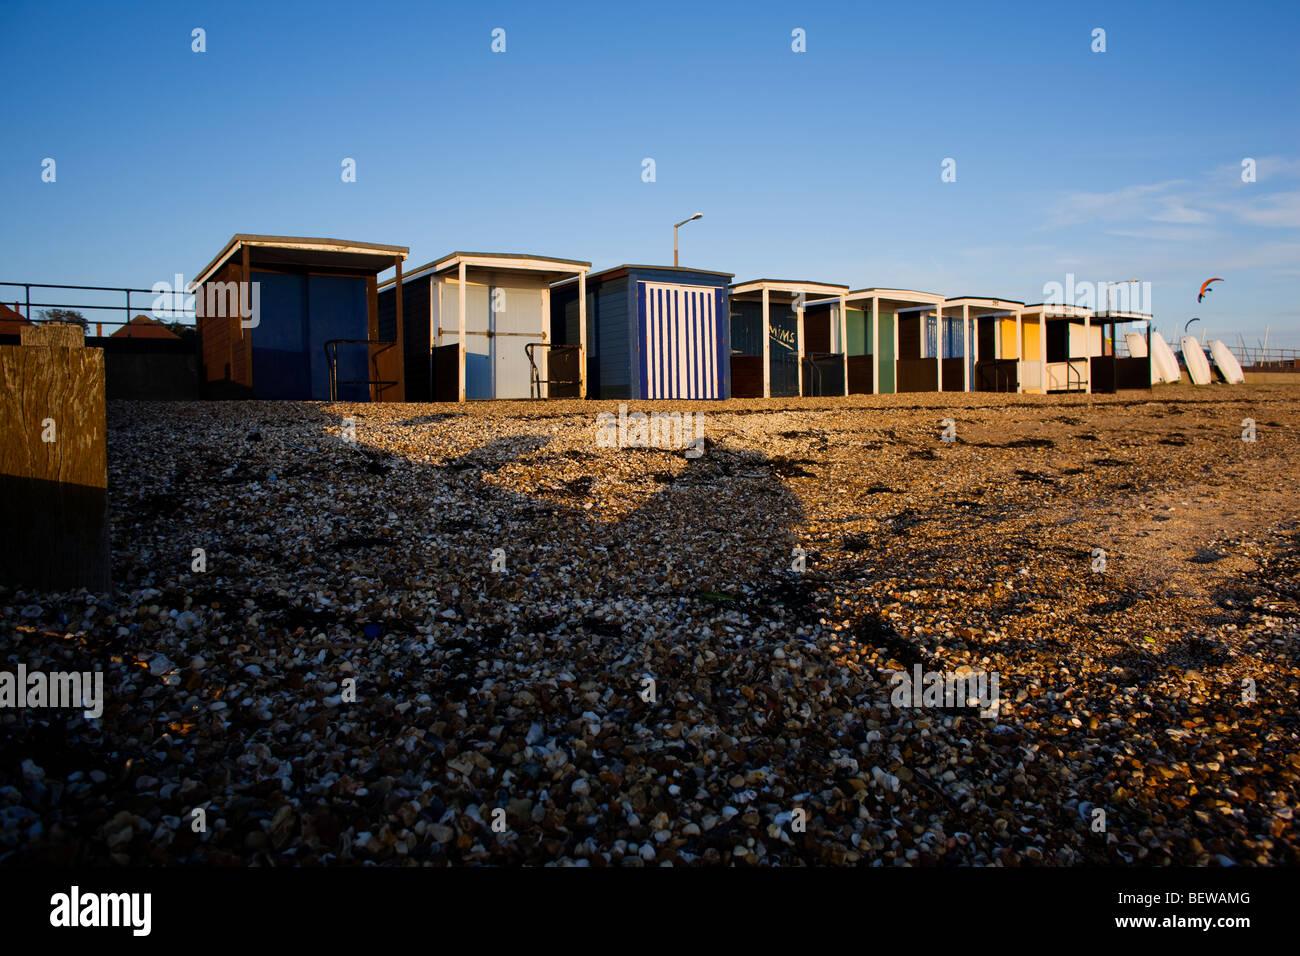 Beach huts on the stoney beach at Shoeburyness in the late autumn sunshine,  near Southend on Sea, Essex, UK - Stock Image